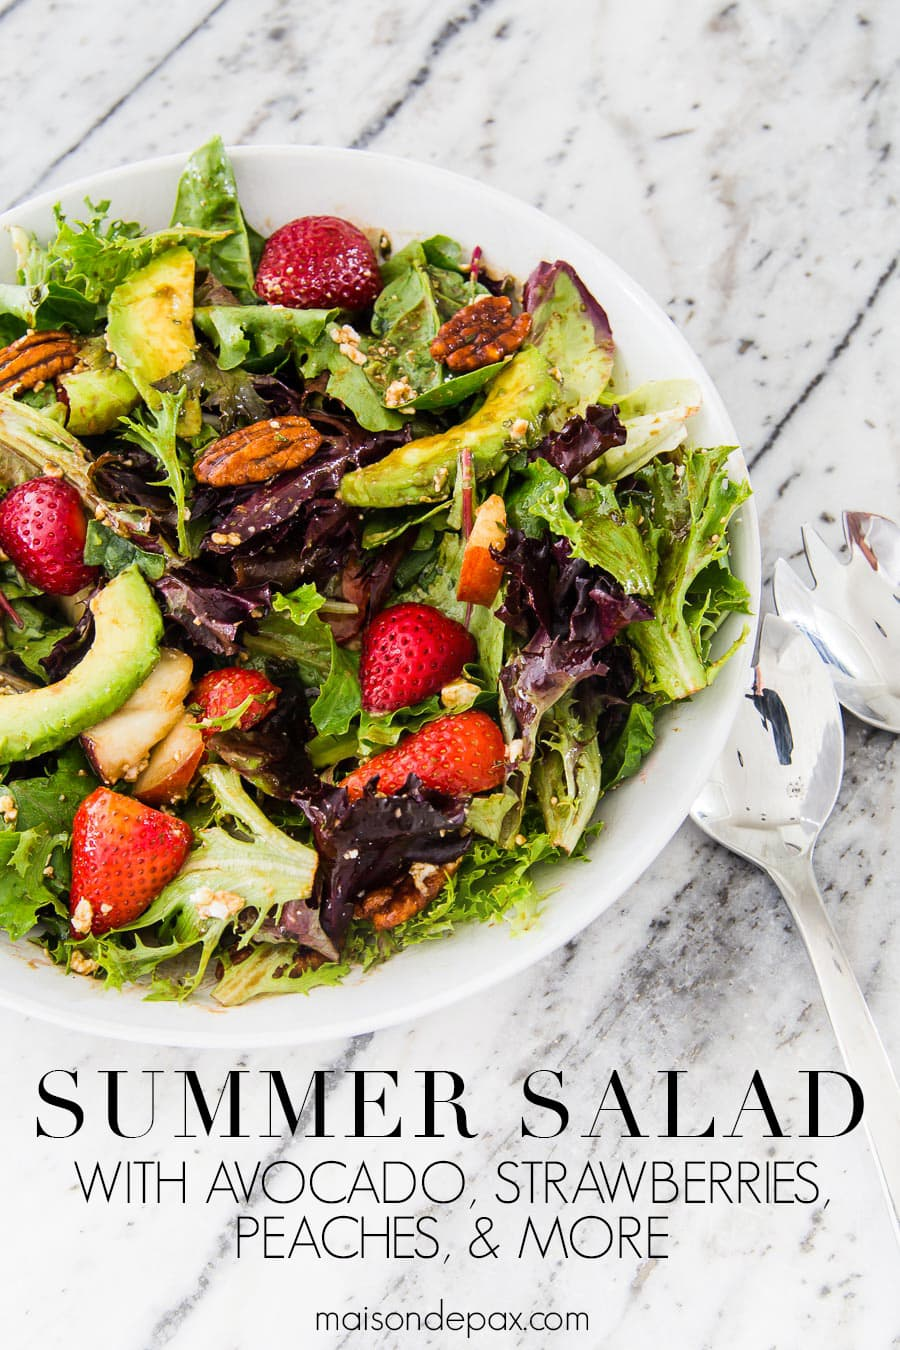 summer salad recipe with mixed greens | Maison de pax